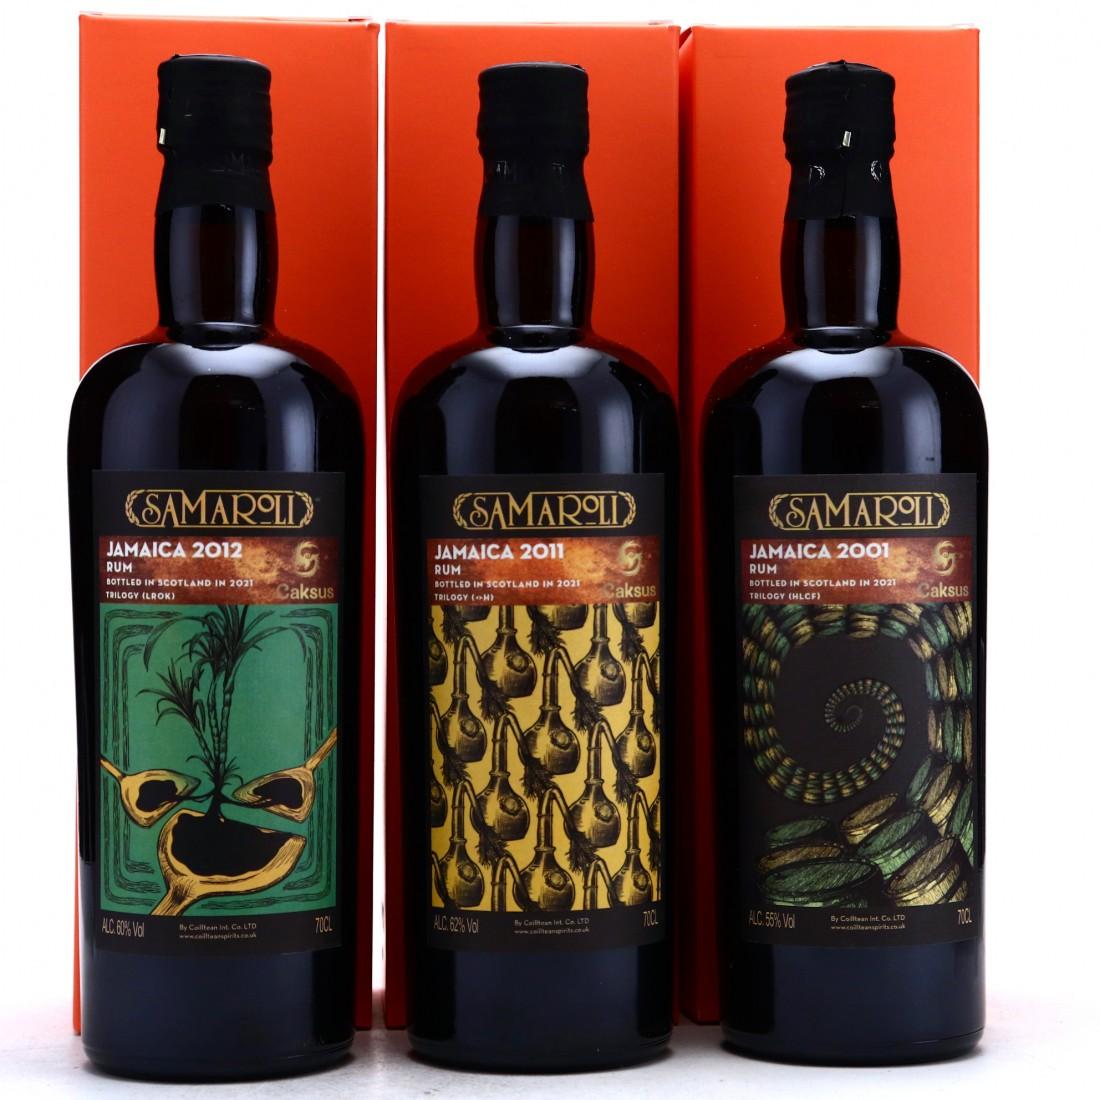 Hampden Samaroli Trilogy for Caksus 3 x 70cl